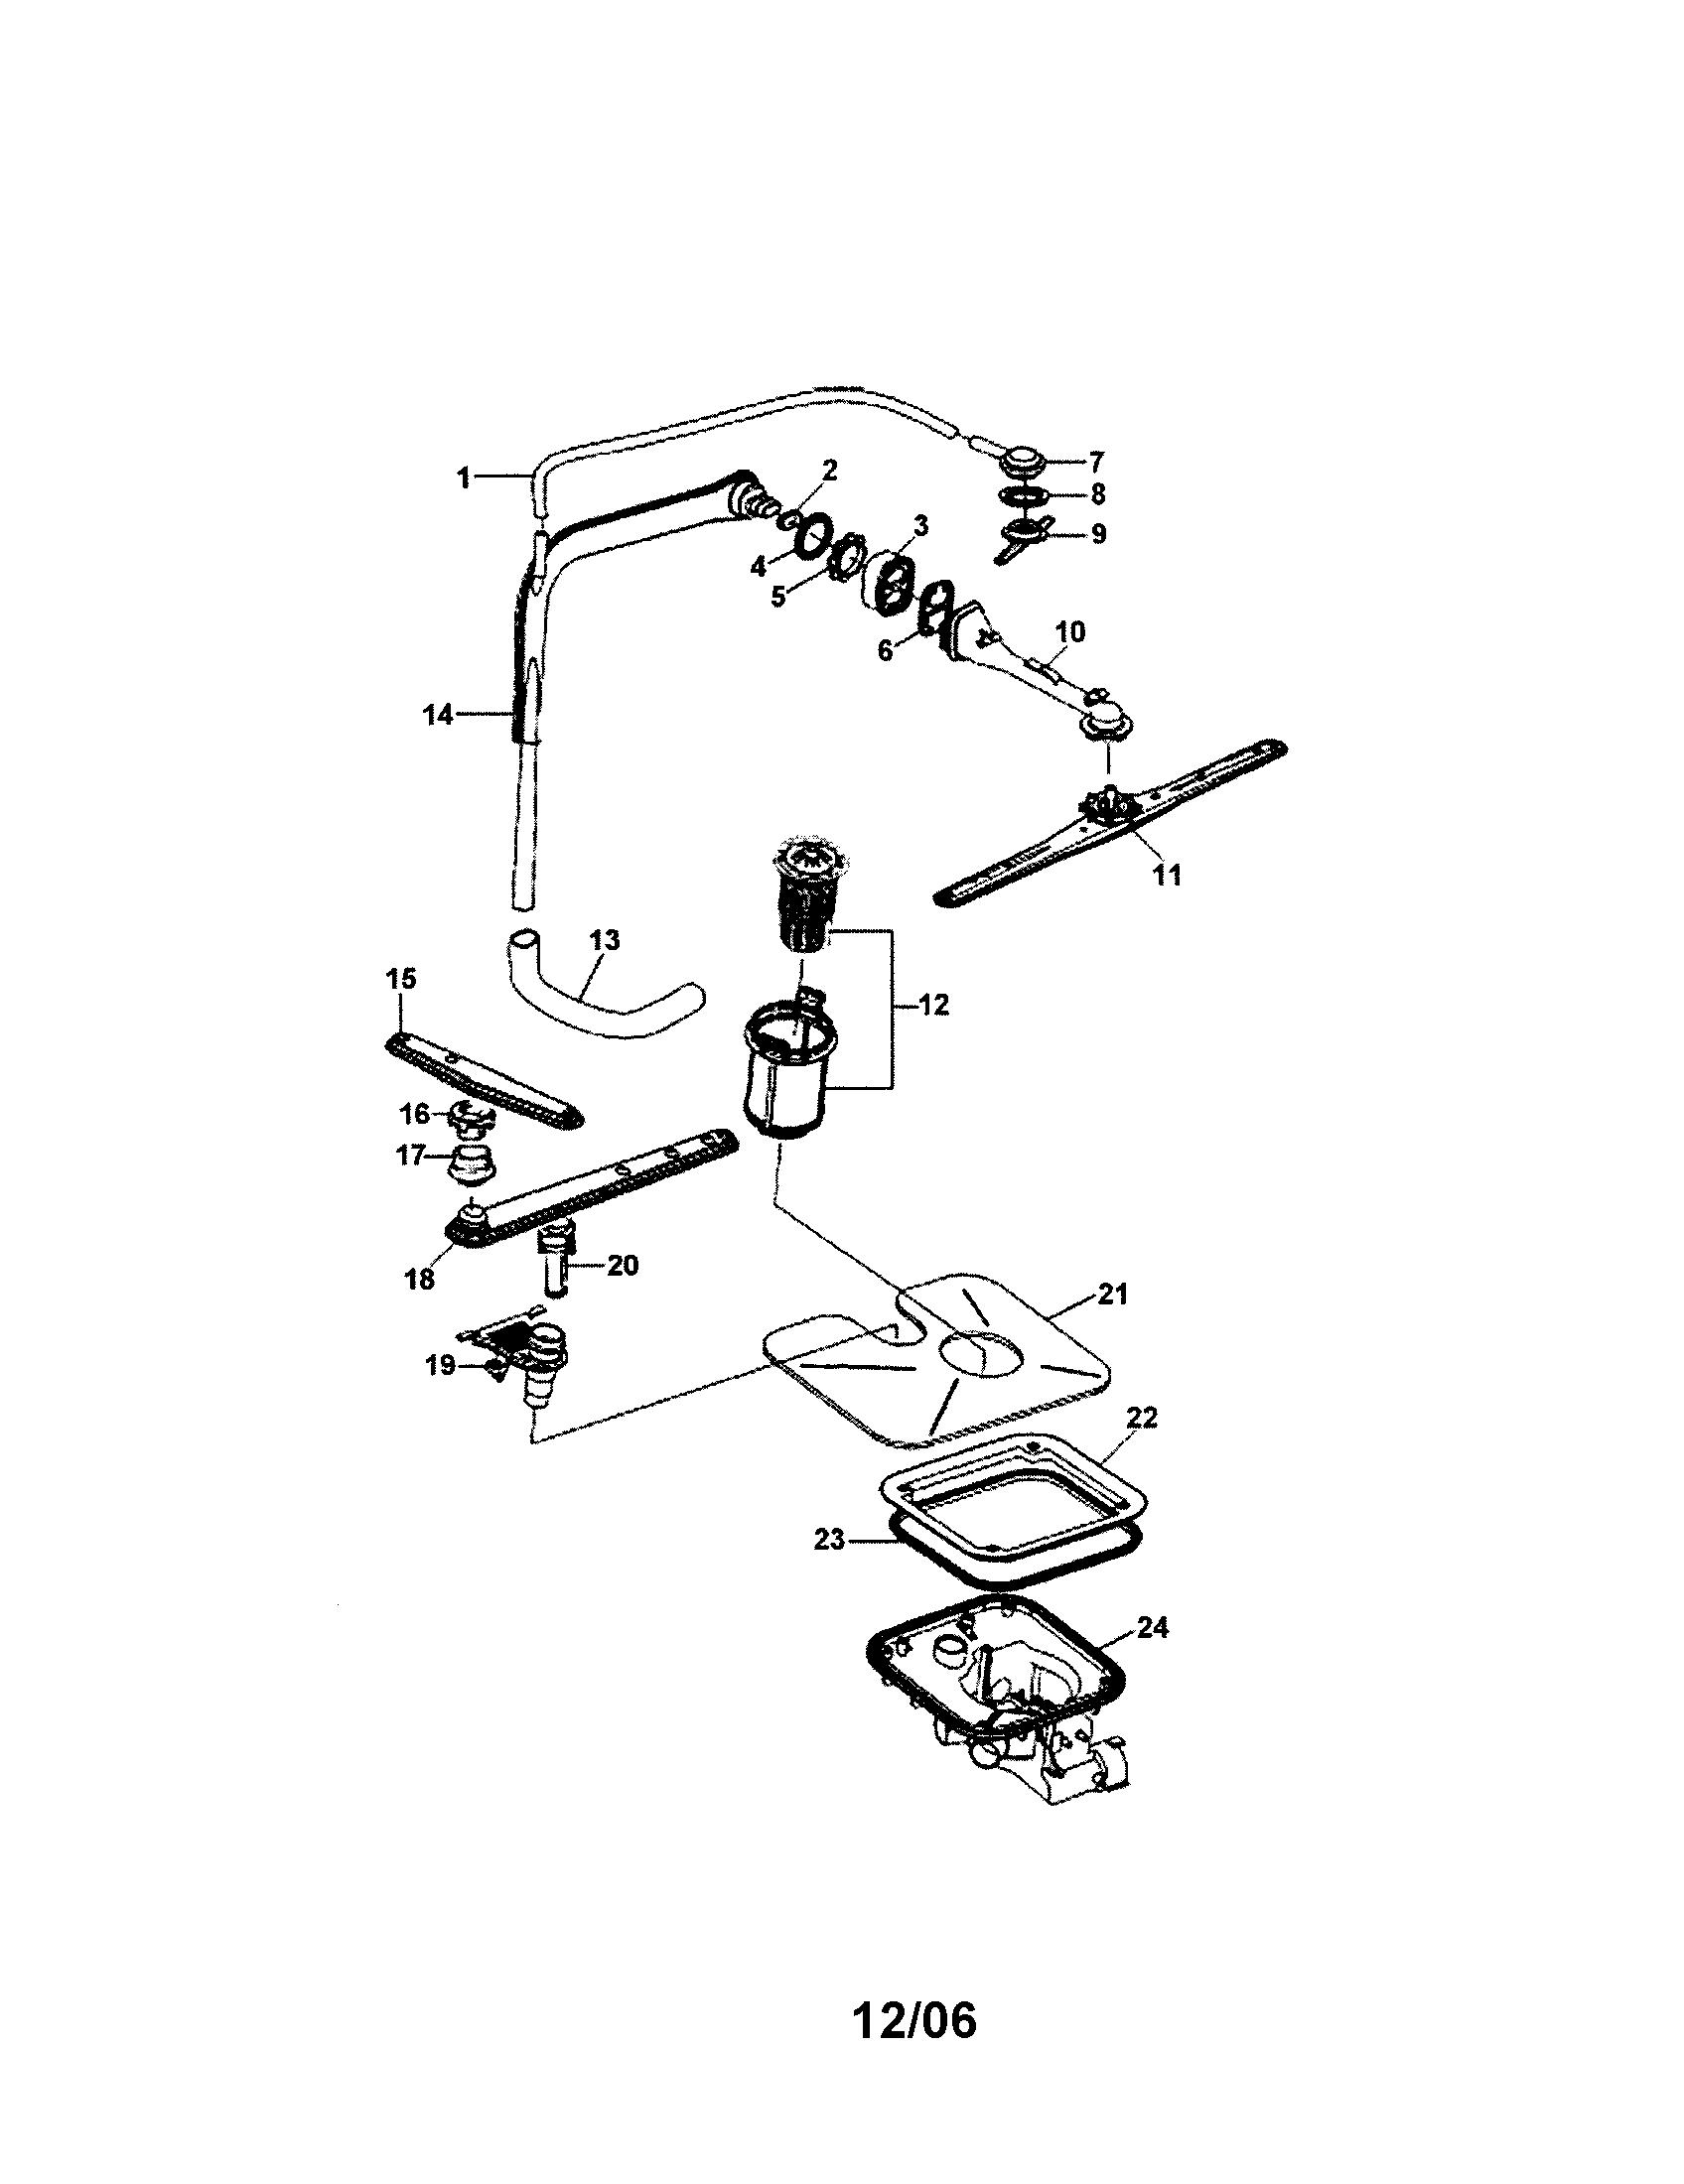 Micrologix 1200 Wiring Diagram : 30 Wiring Diagram Images